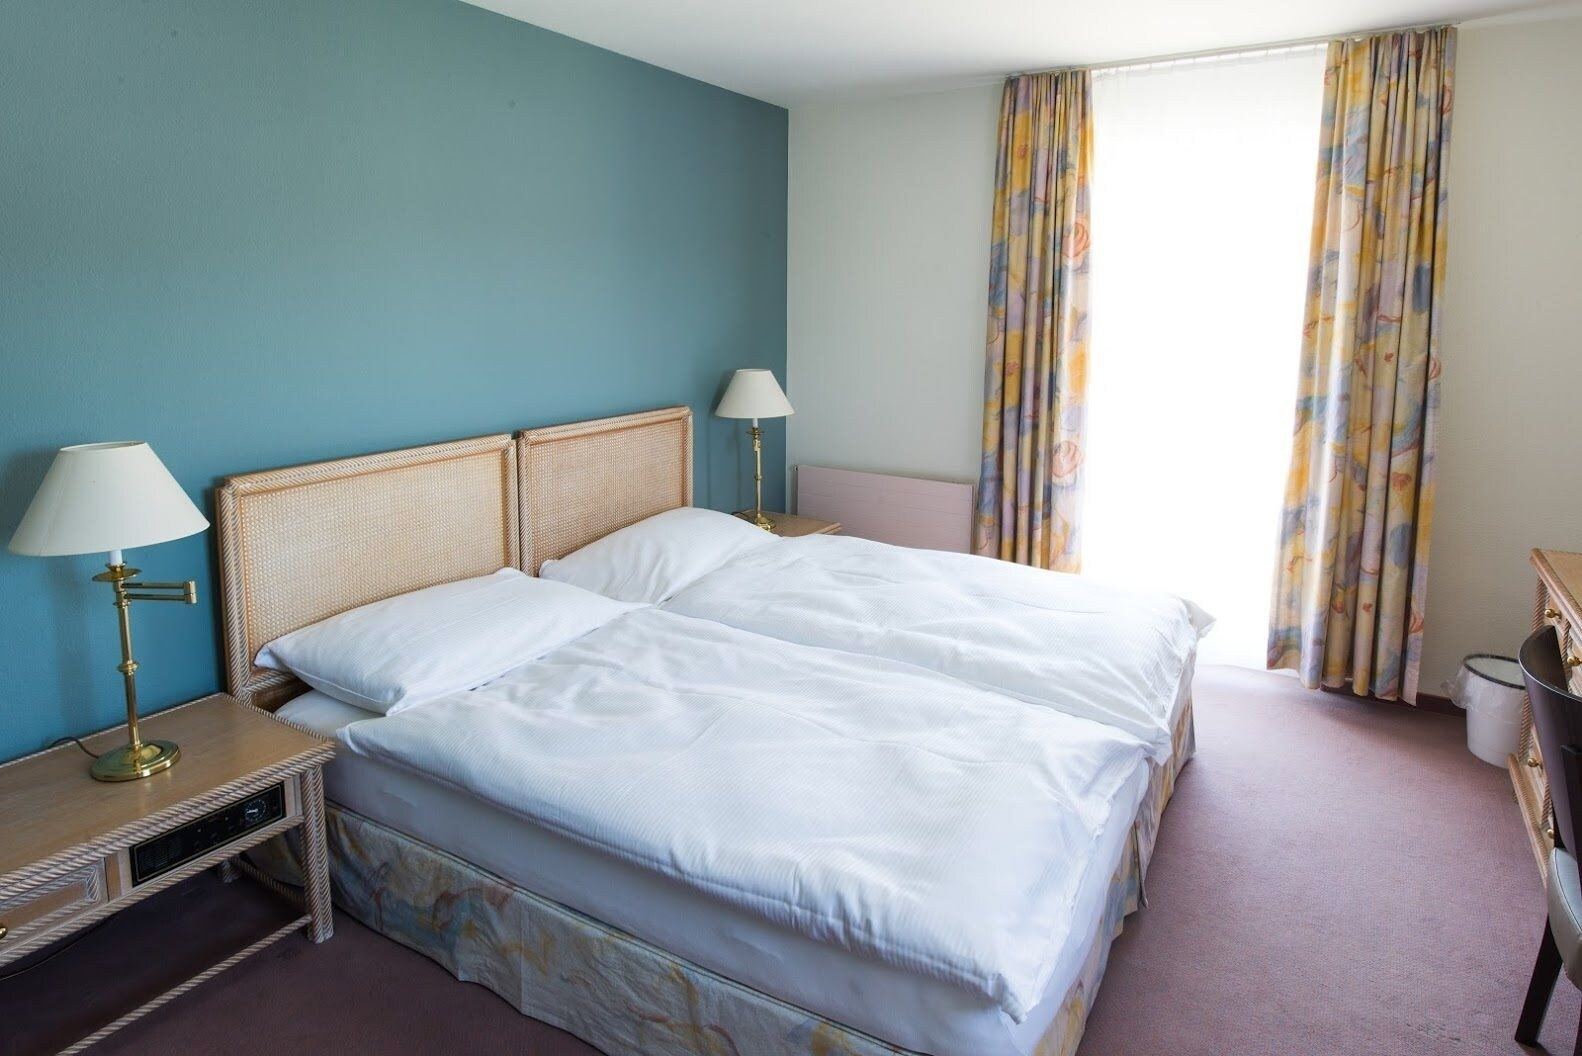 Hotel Ascott, Aarau